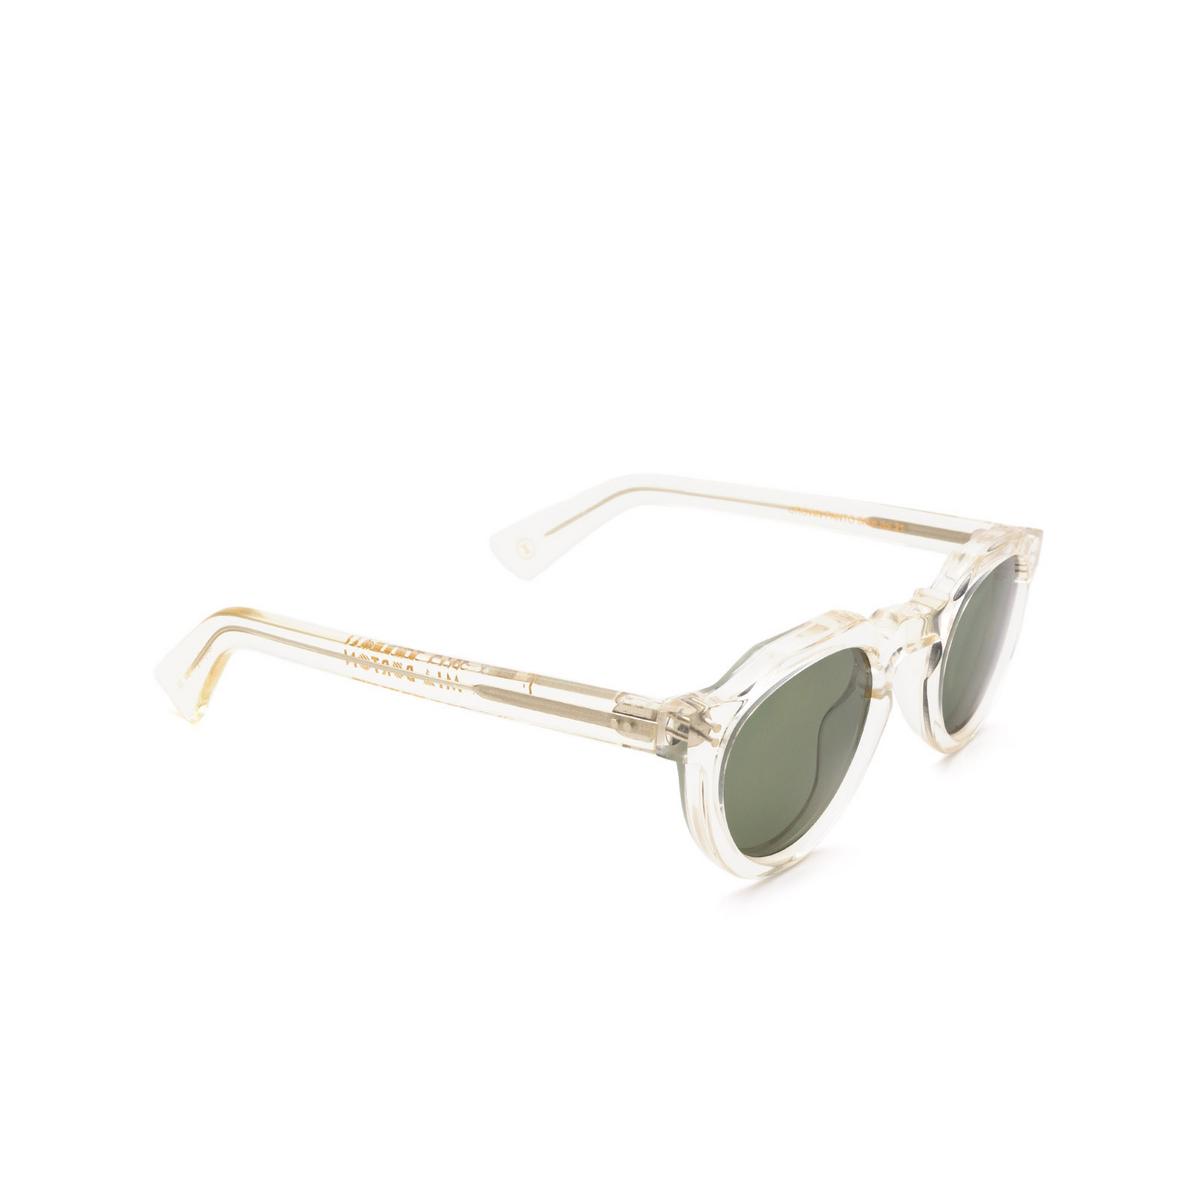 Lesca® Irregular Sunglasses: Crown Panto X Mia Burton color 21 - GROUNDED GREEN - three-quarters view.